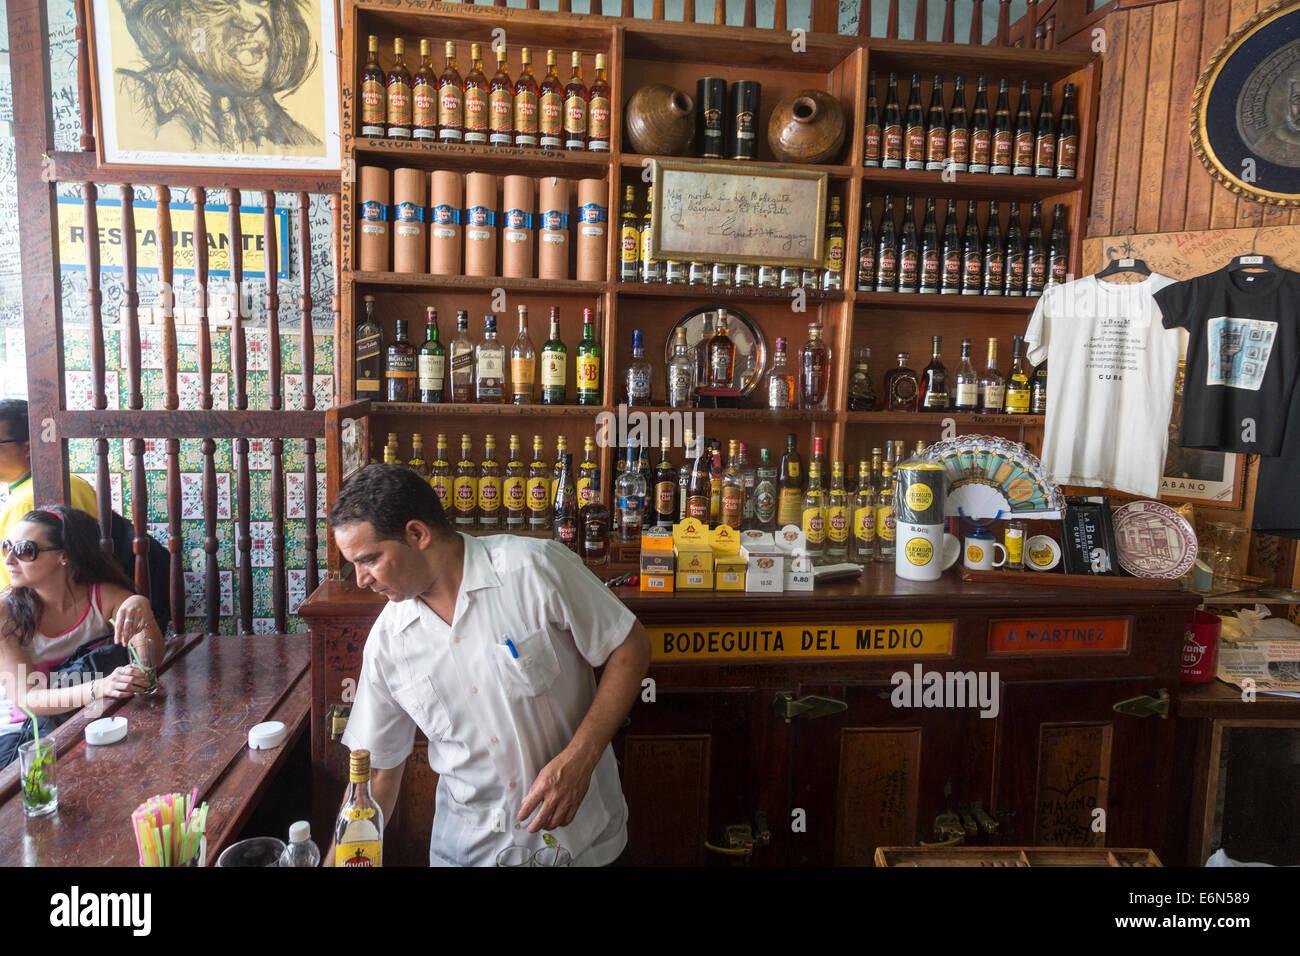 Barkeeper servieren bei La Bodeguita del Medio Bar, Havanna, Kuba Stockbild